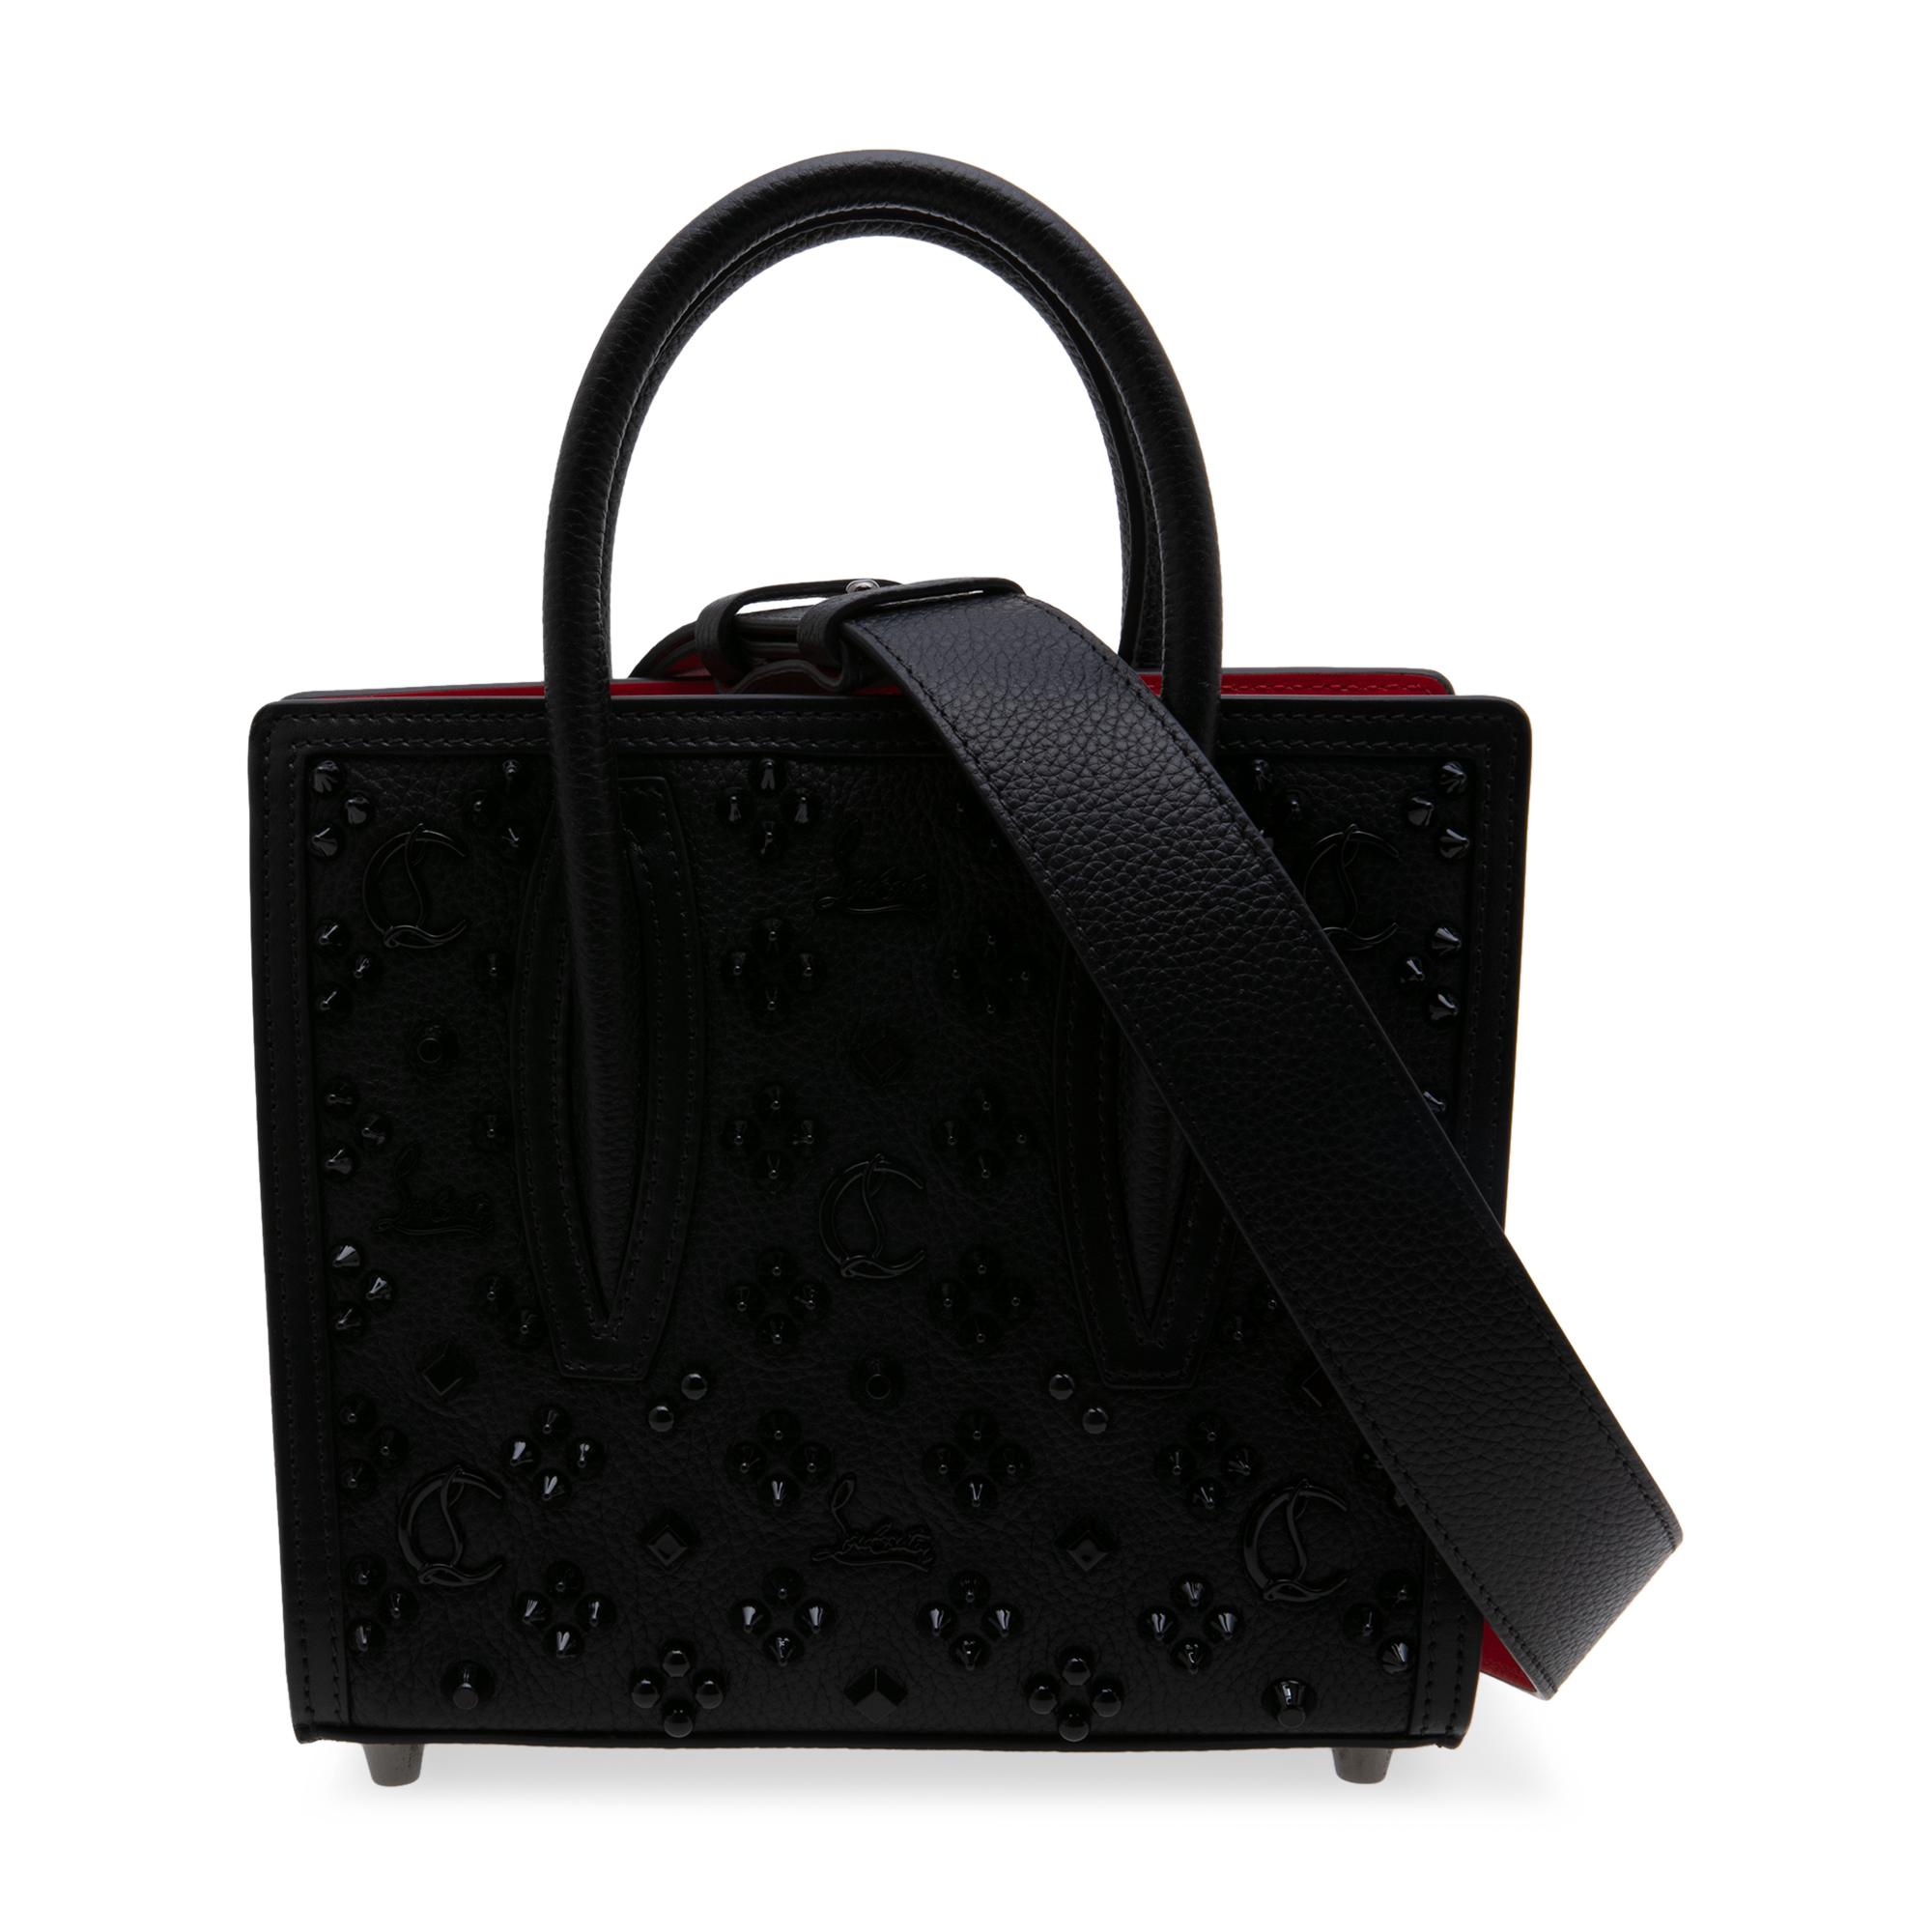 Paloma S mini top handle bag